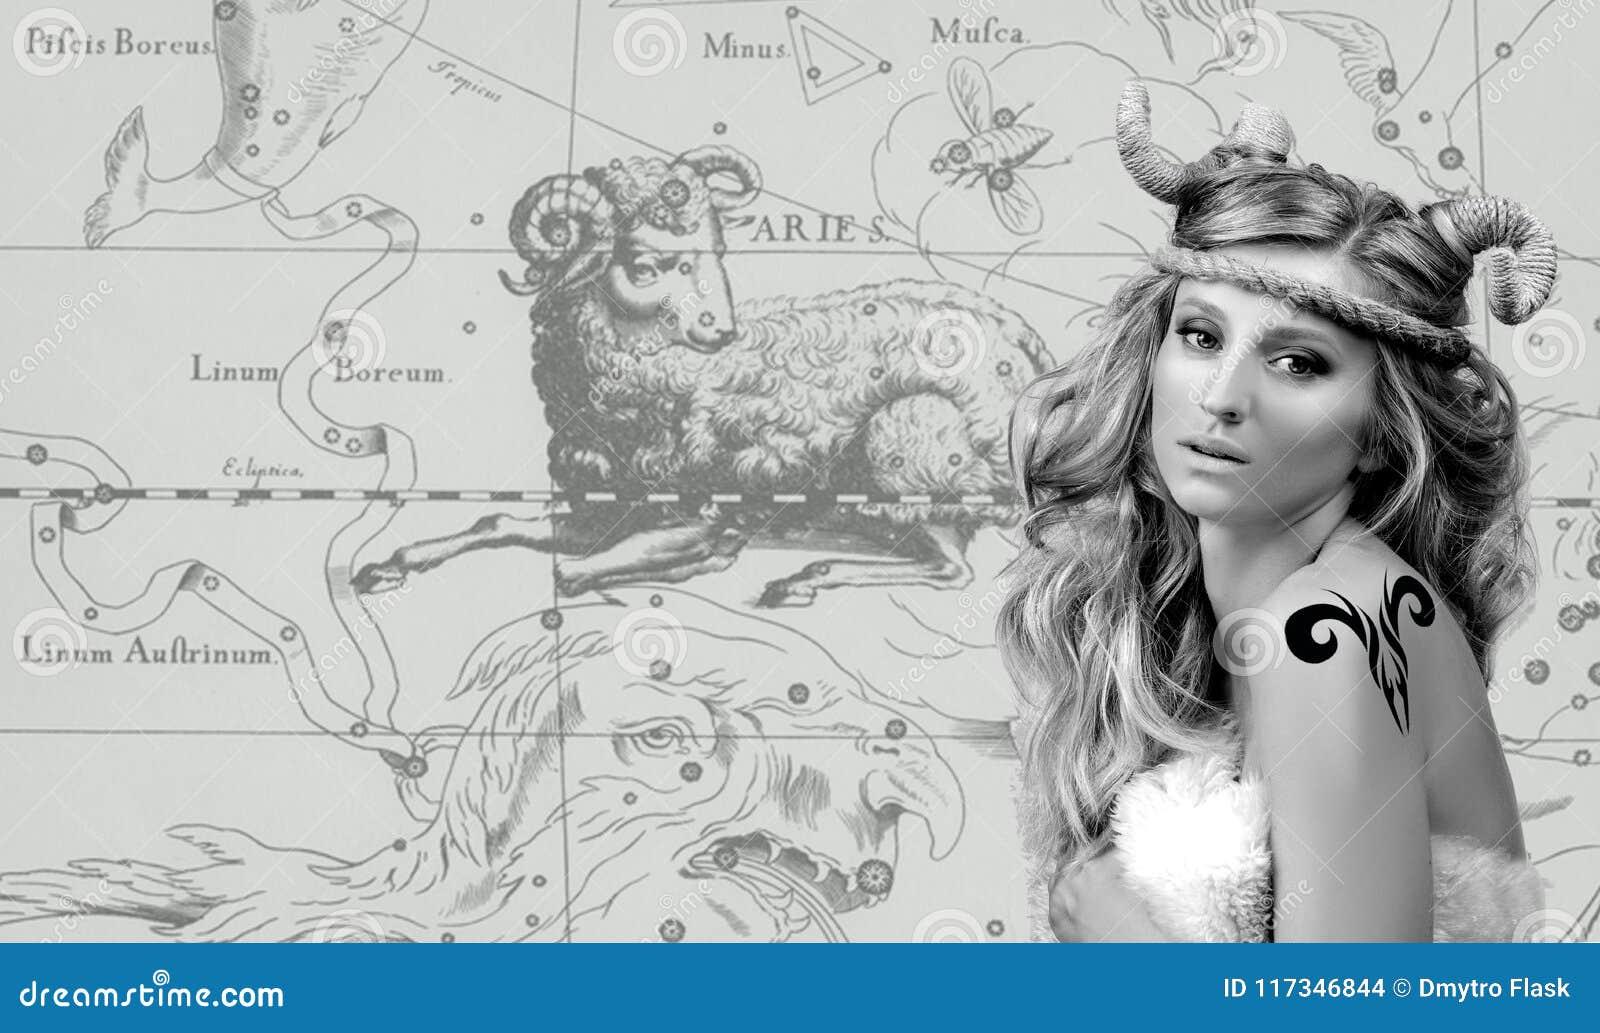 Astrology Mulher Aries Zodiac Sign